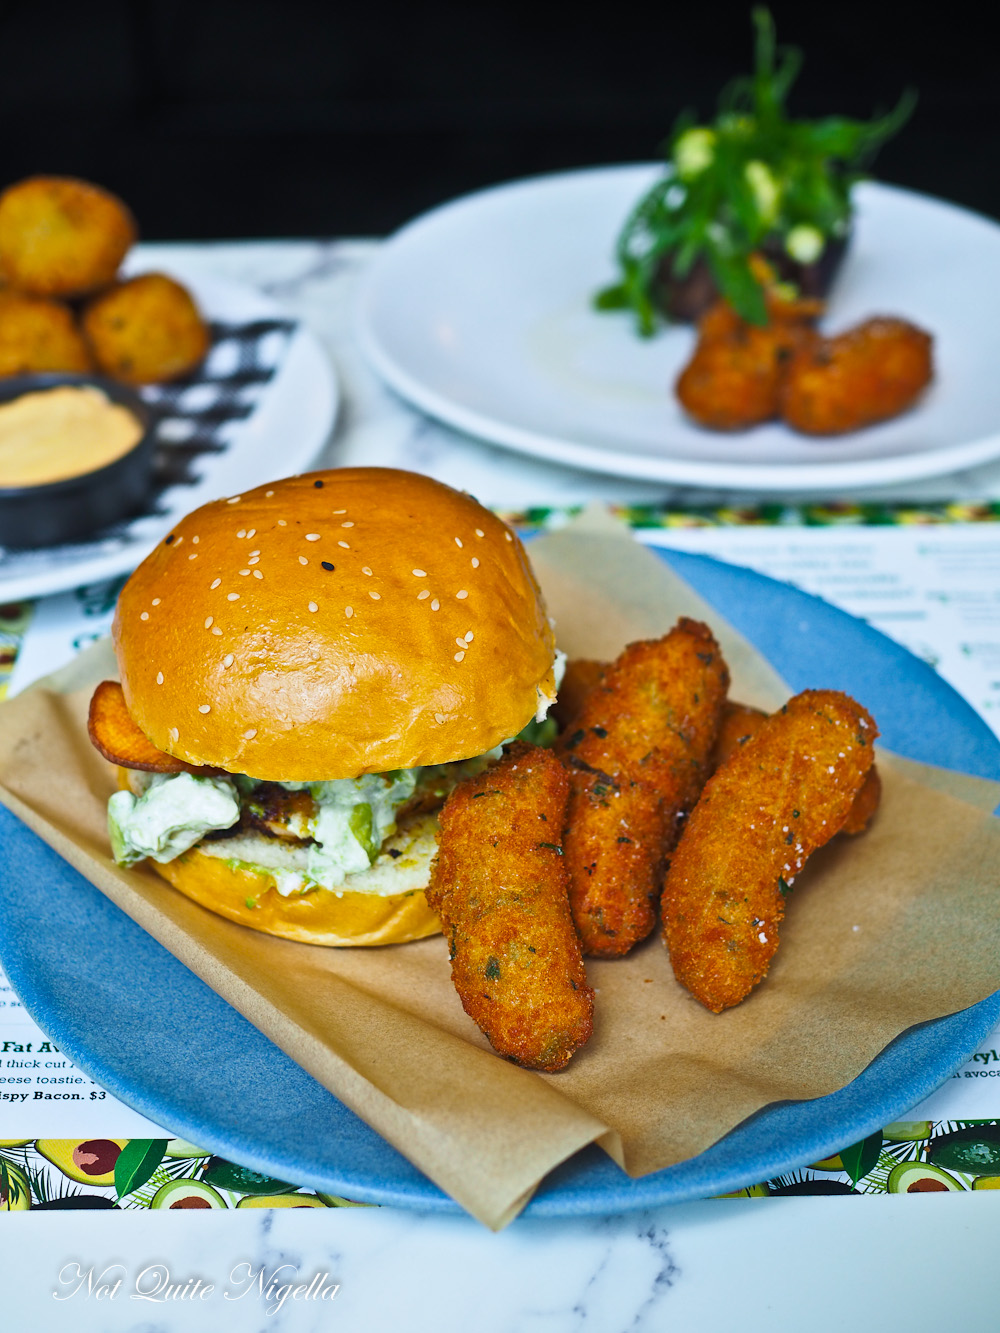 Avocado Restaurant Sydney Good Fat Surry Hills